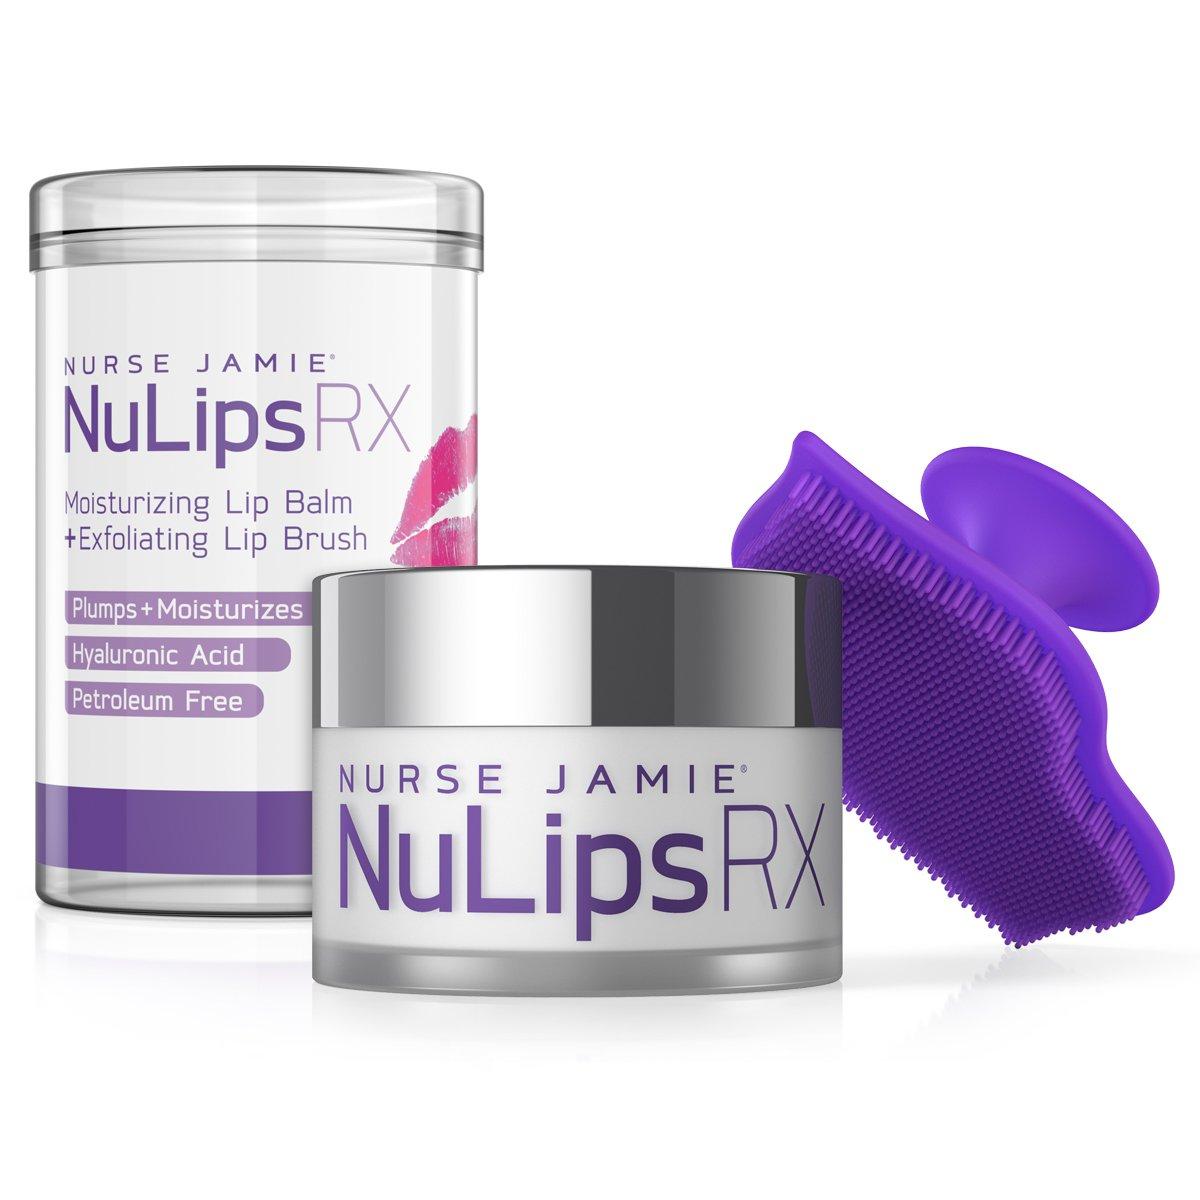 Nurse Jamie Nulips RX Moisturizing Lip Balm & Exfoliating Lip Brush